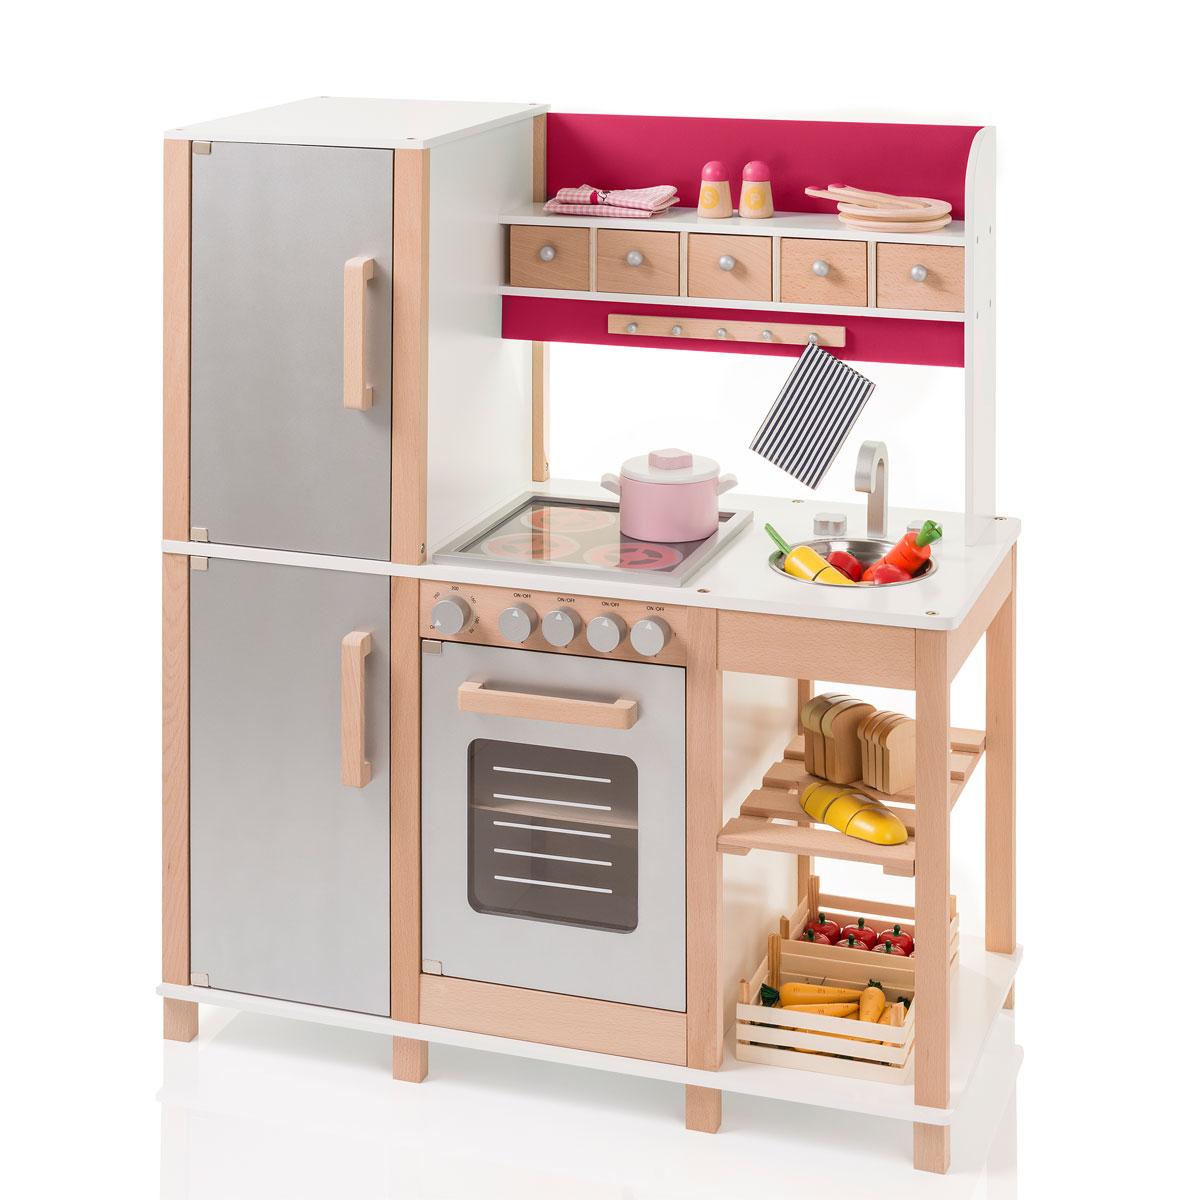 SUN Kinderküche natur beere aus Holz mit Kühlschrank